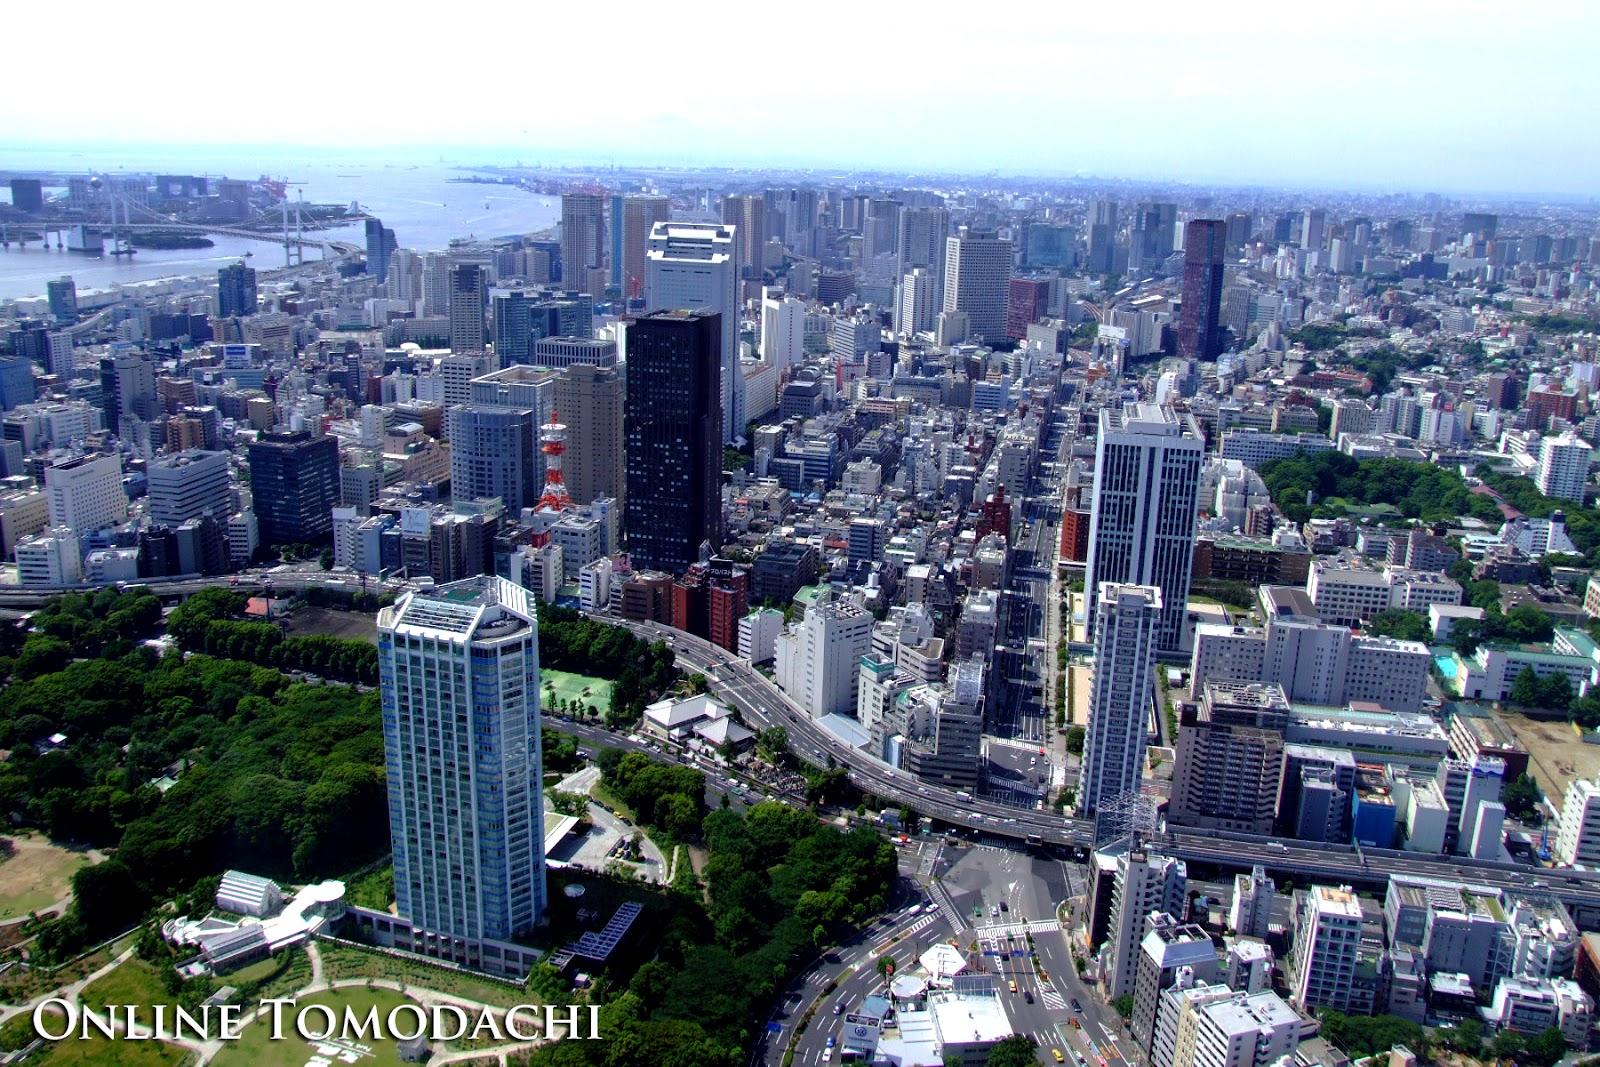 Online Tomodachi: Tokyo City Sky View